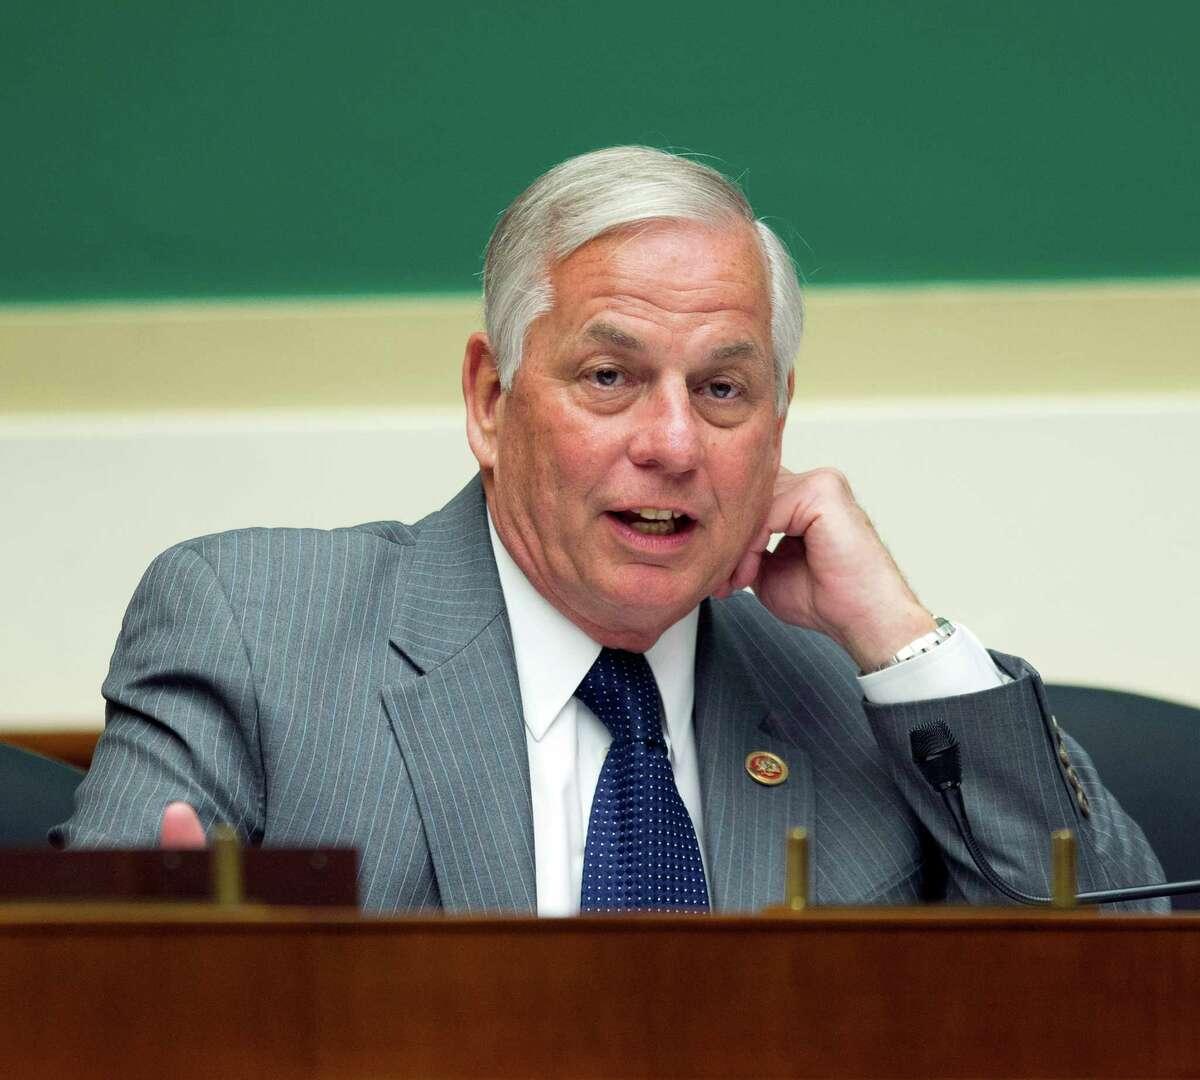 Rep. Gene Green, D-Houston, wants to tweak Gardner's bill so LNG export reviews are streamlined.